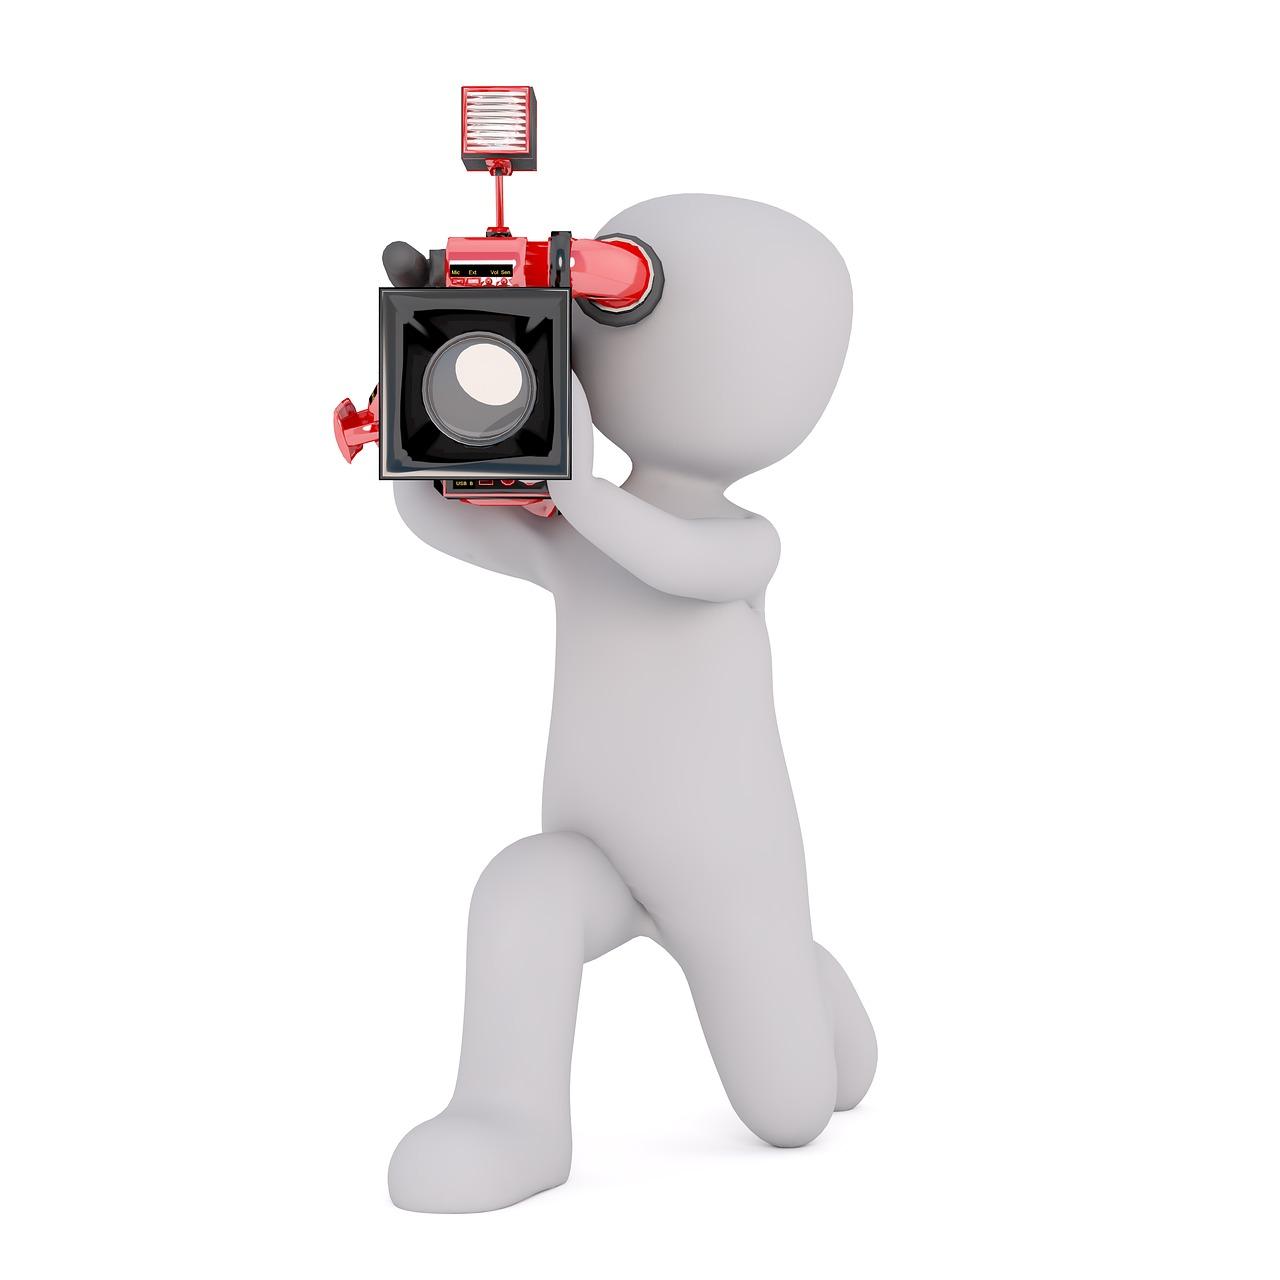 camera, video camera, man